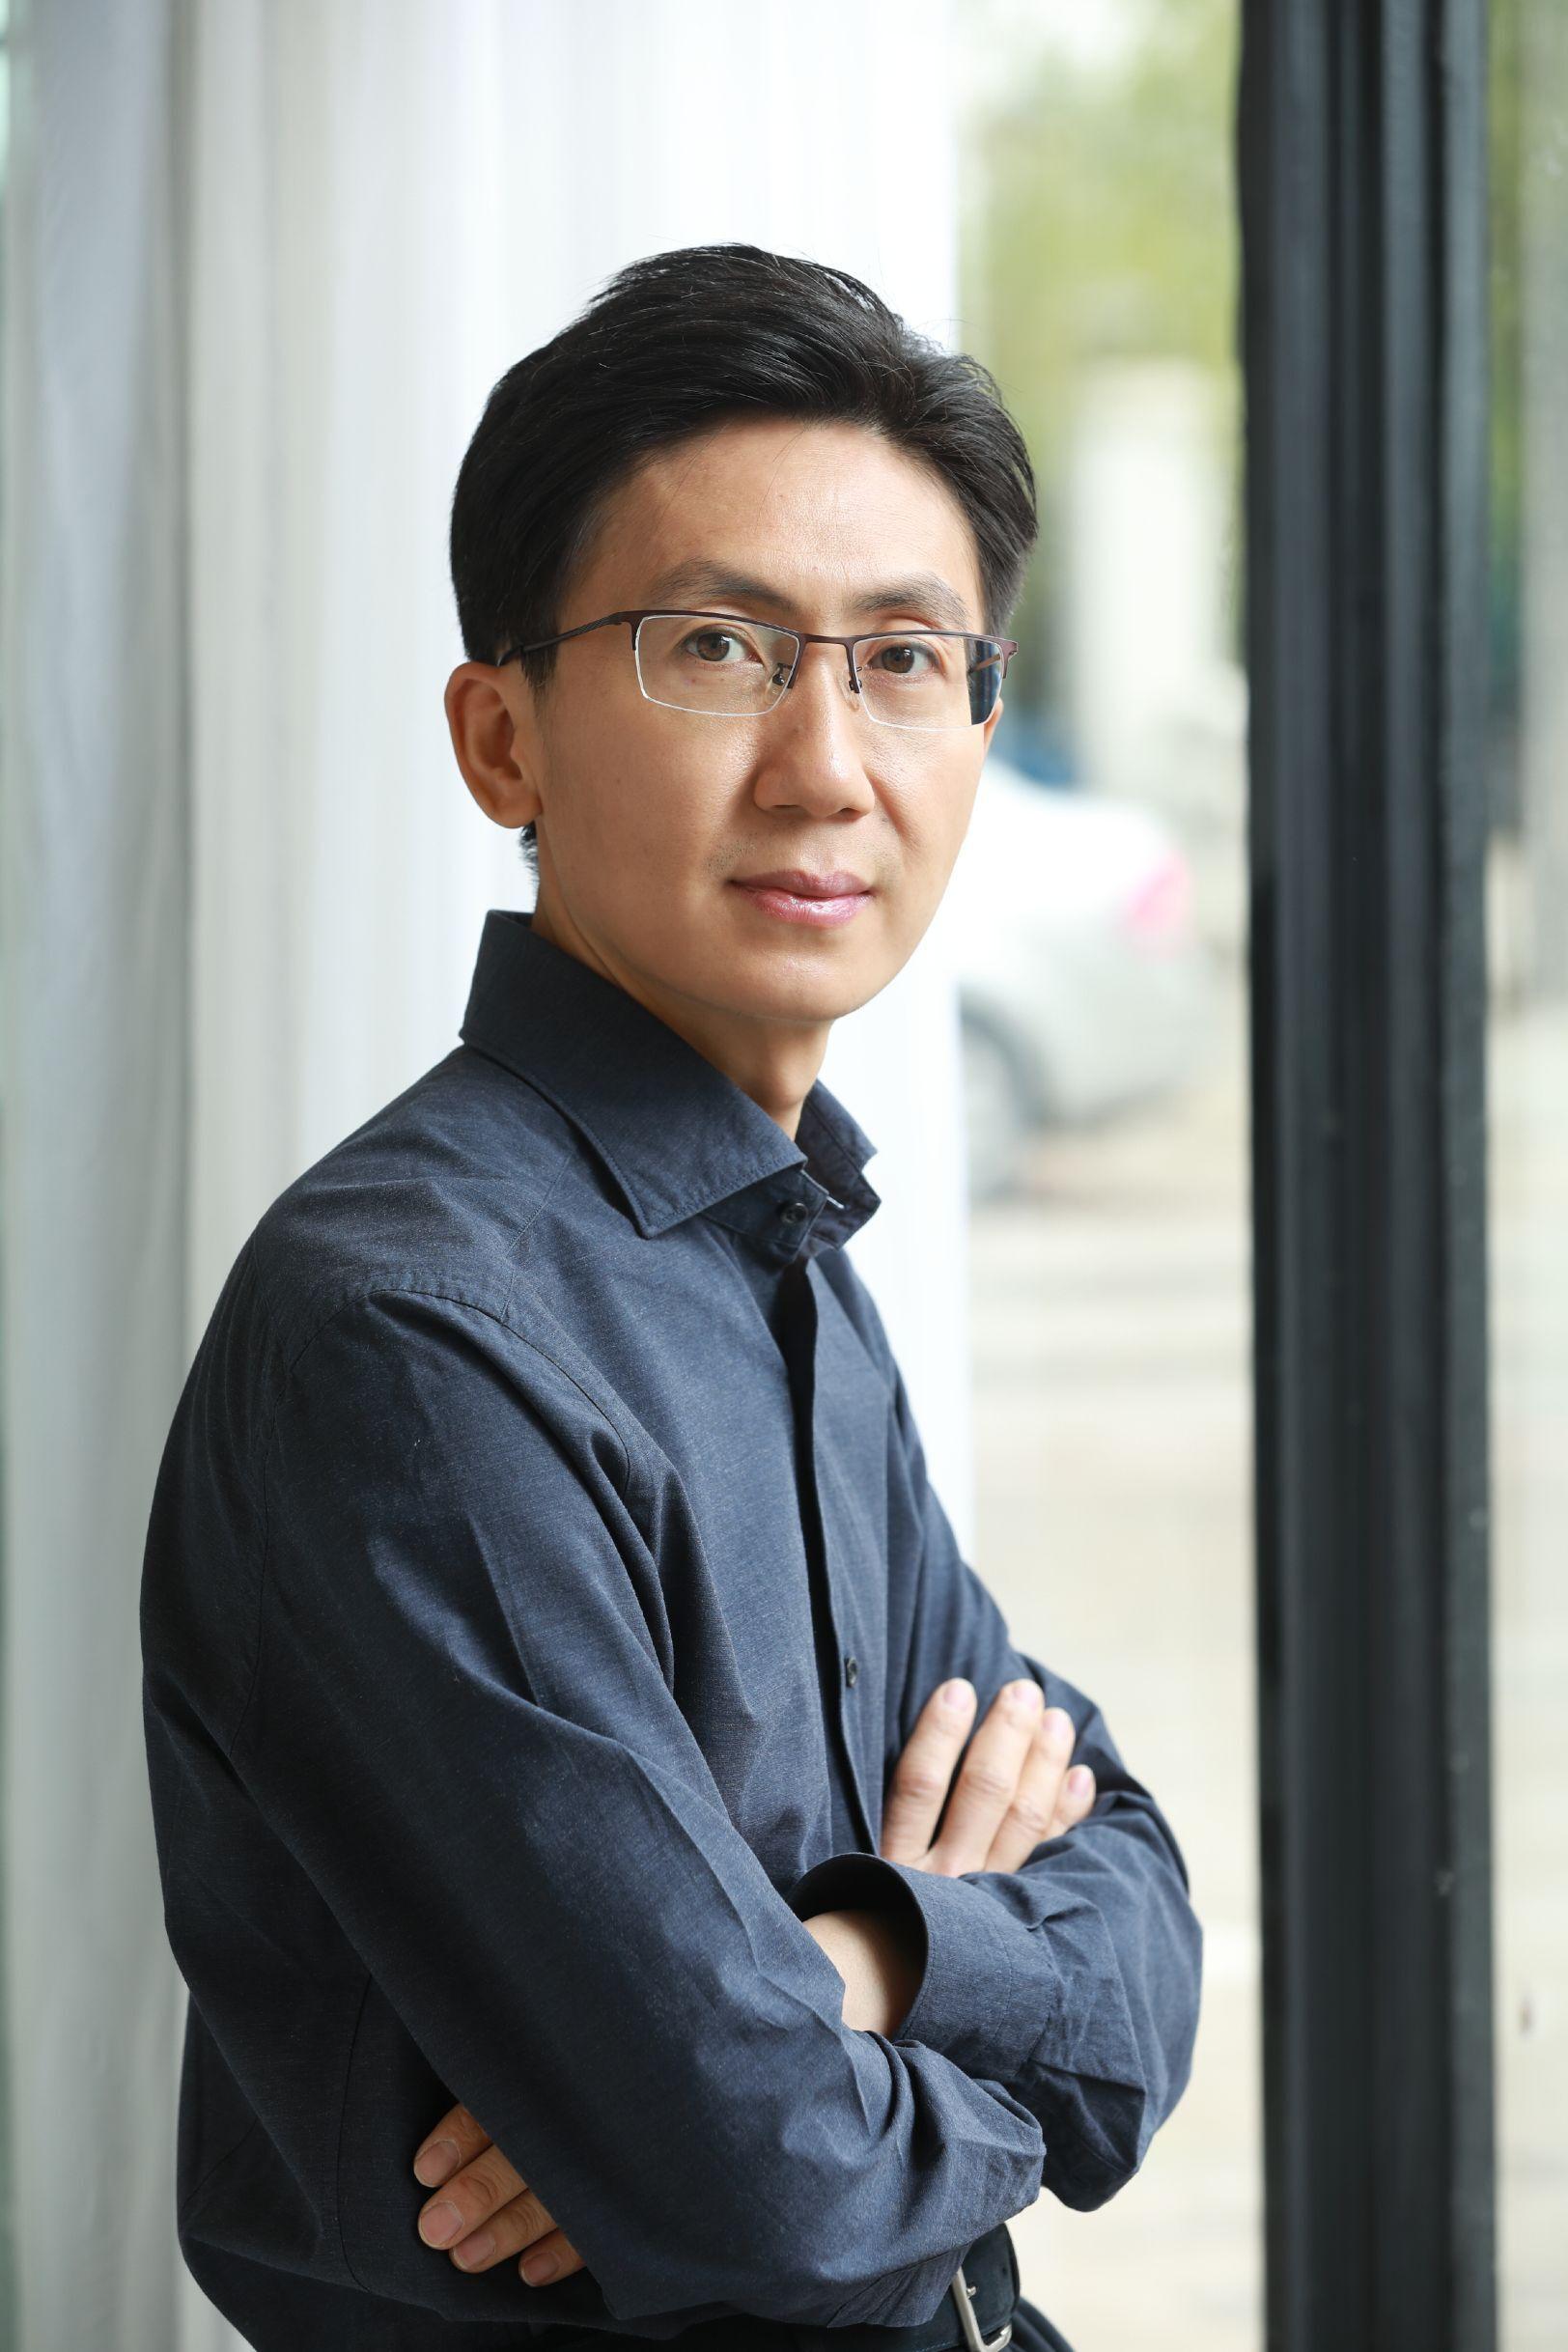 vivo通信研究院院长秦飞:年内全系列推出5G手机,覆盖 2000-6000元价位段